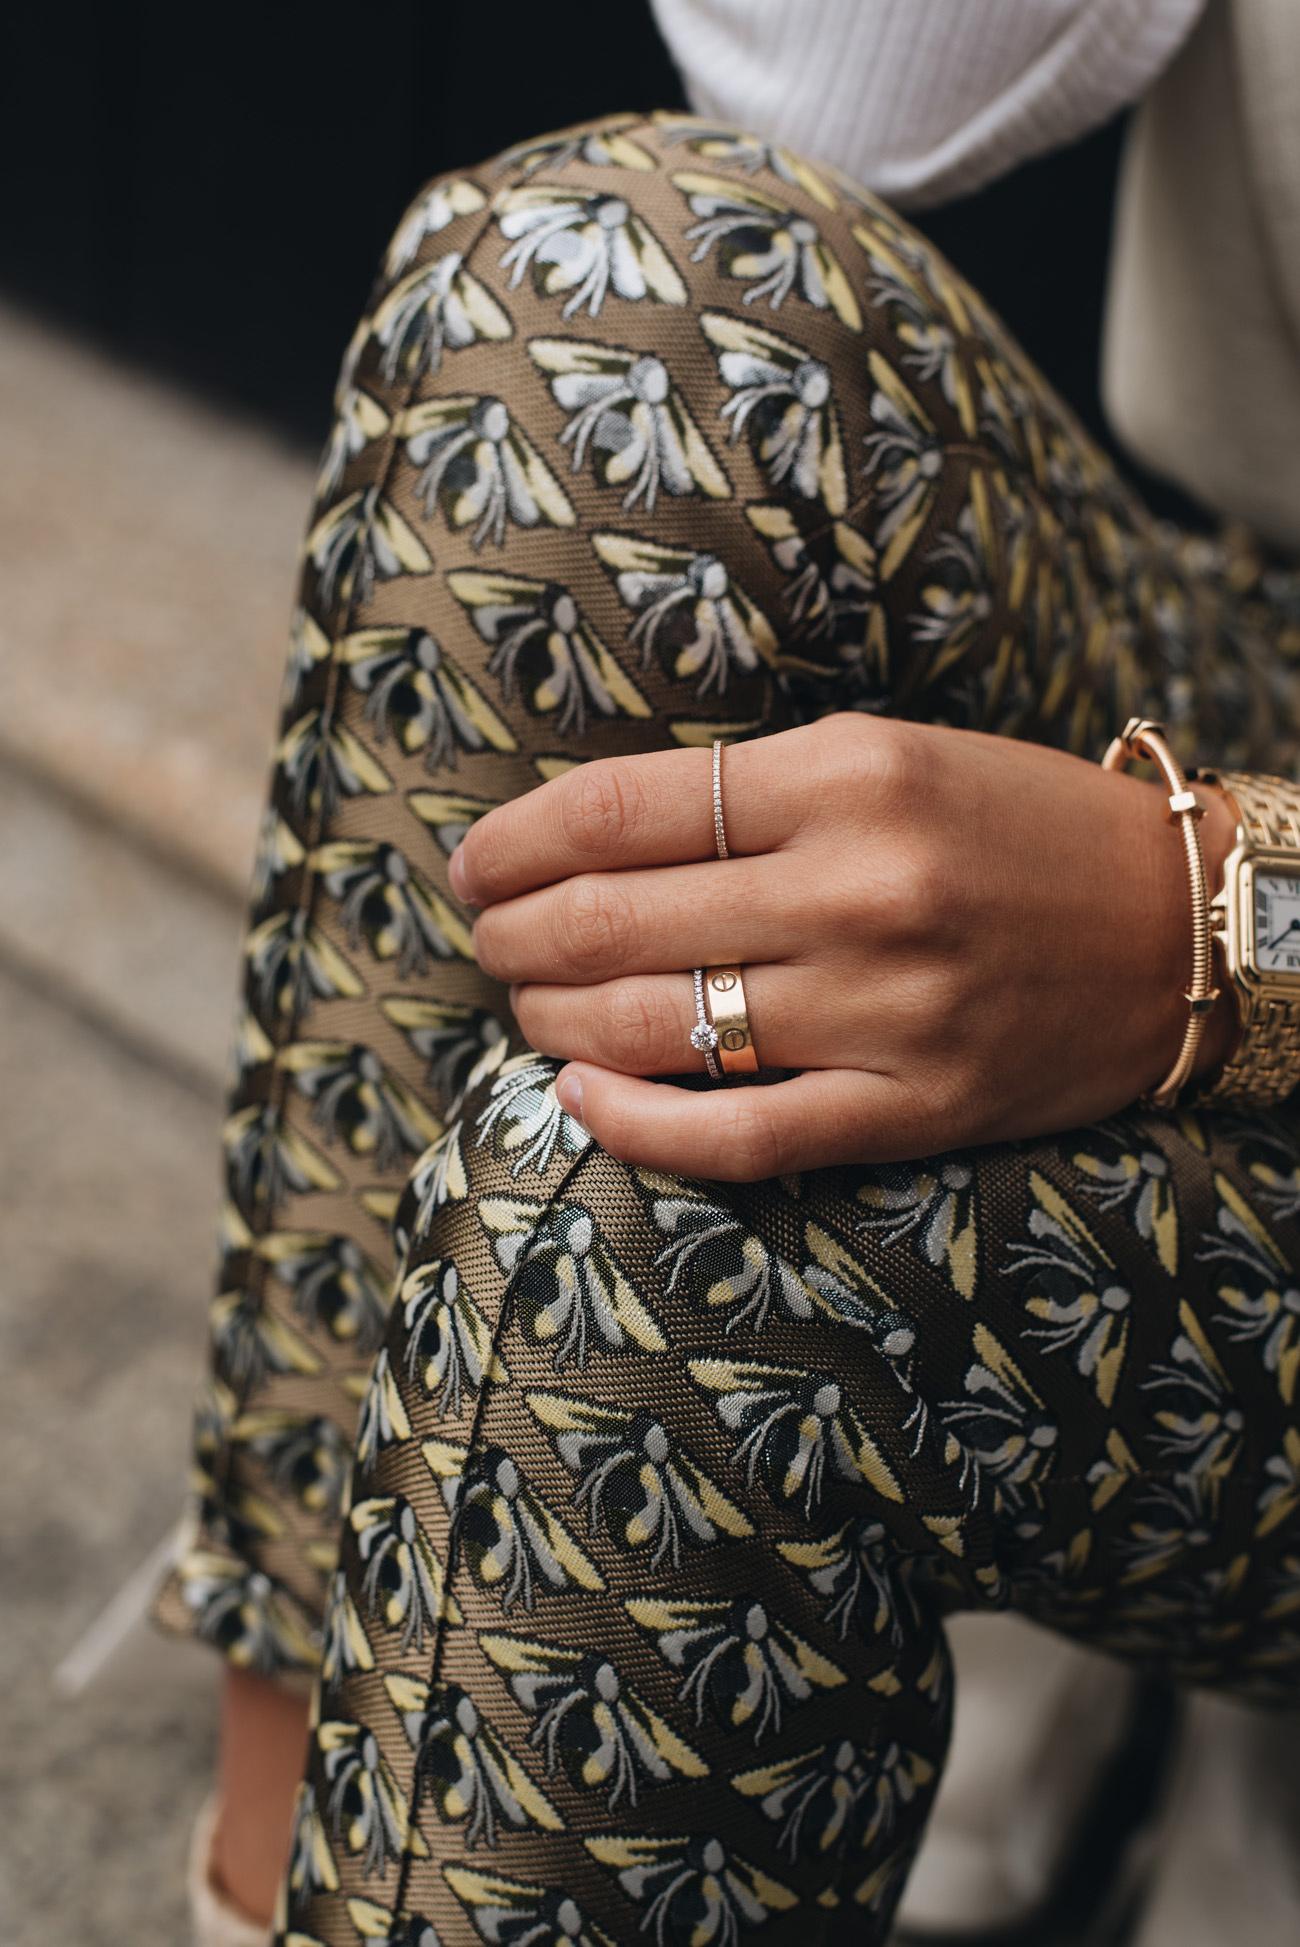 Cartier-Schmuck-Ikonen-Klassiker-Love-Bracelet-schmal-Panthere-Uhr-Trinity-Armband-nina-schwichtenberg-fashiioncarpet